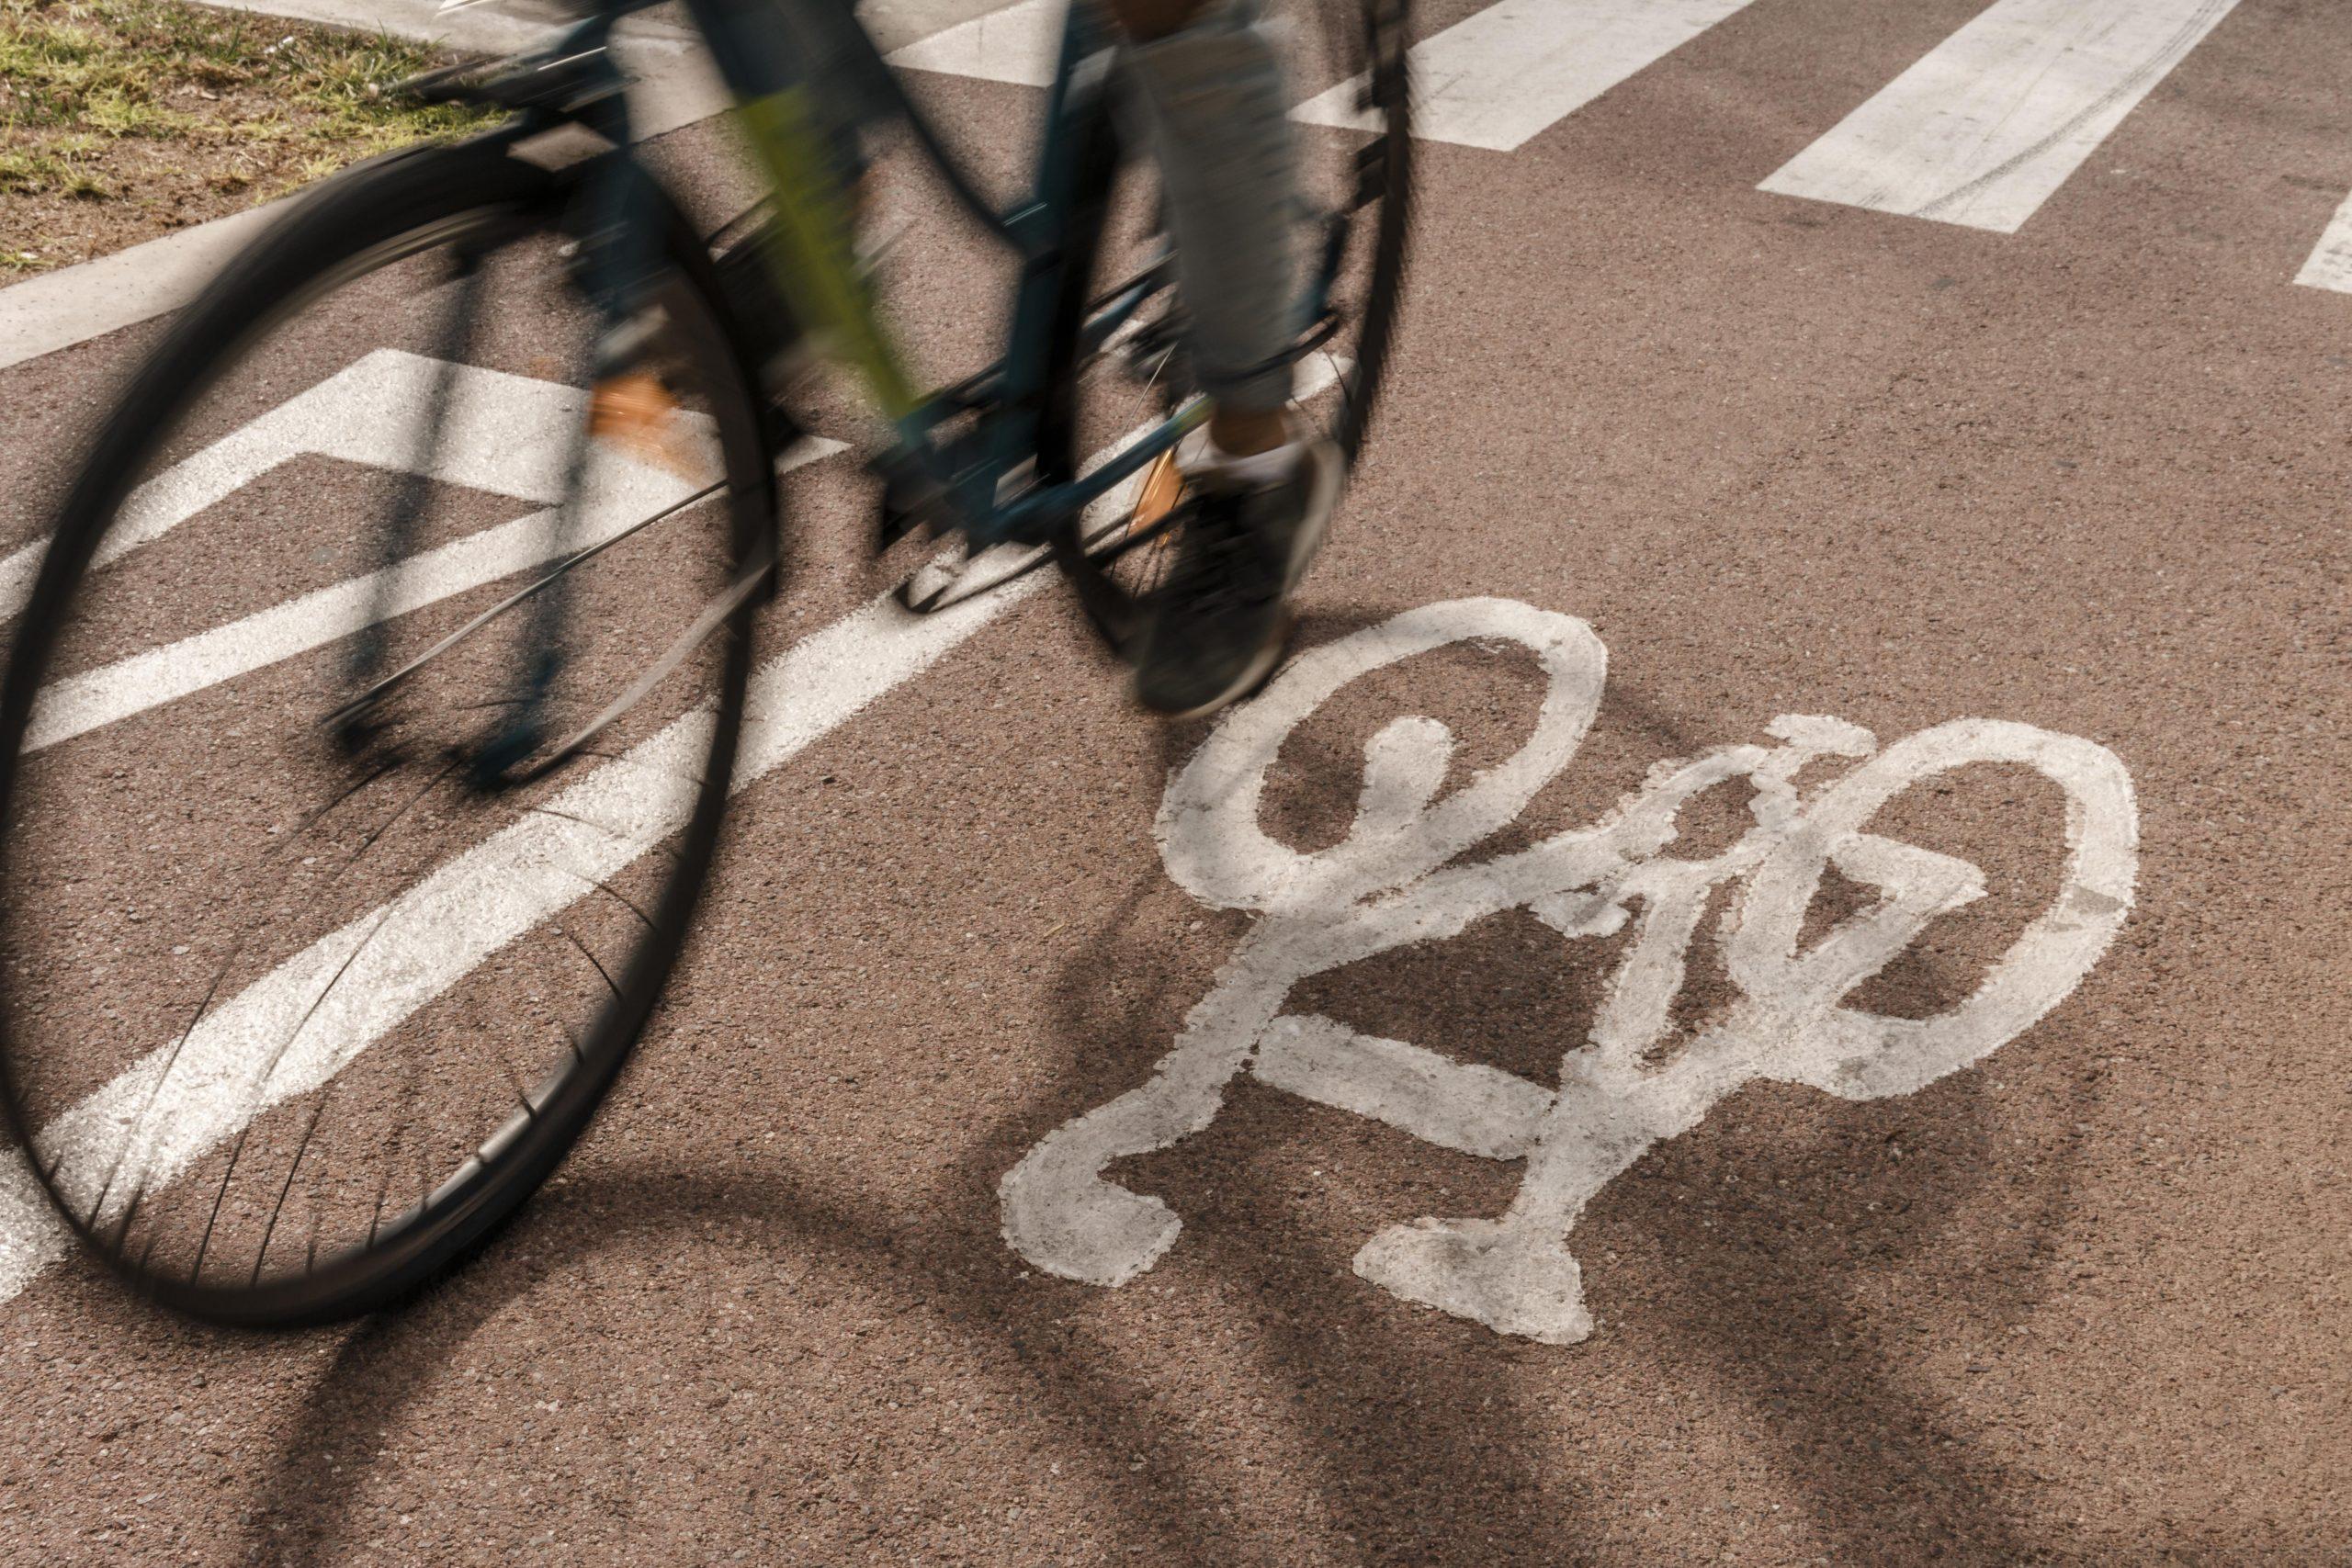 bike-lane-close-up-on-the-road